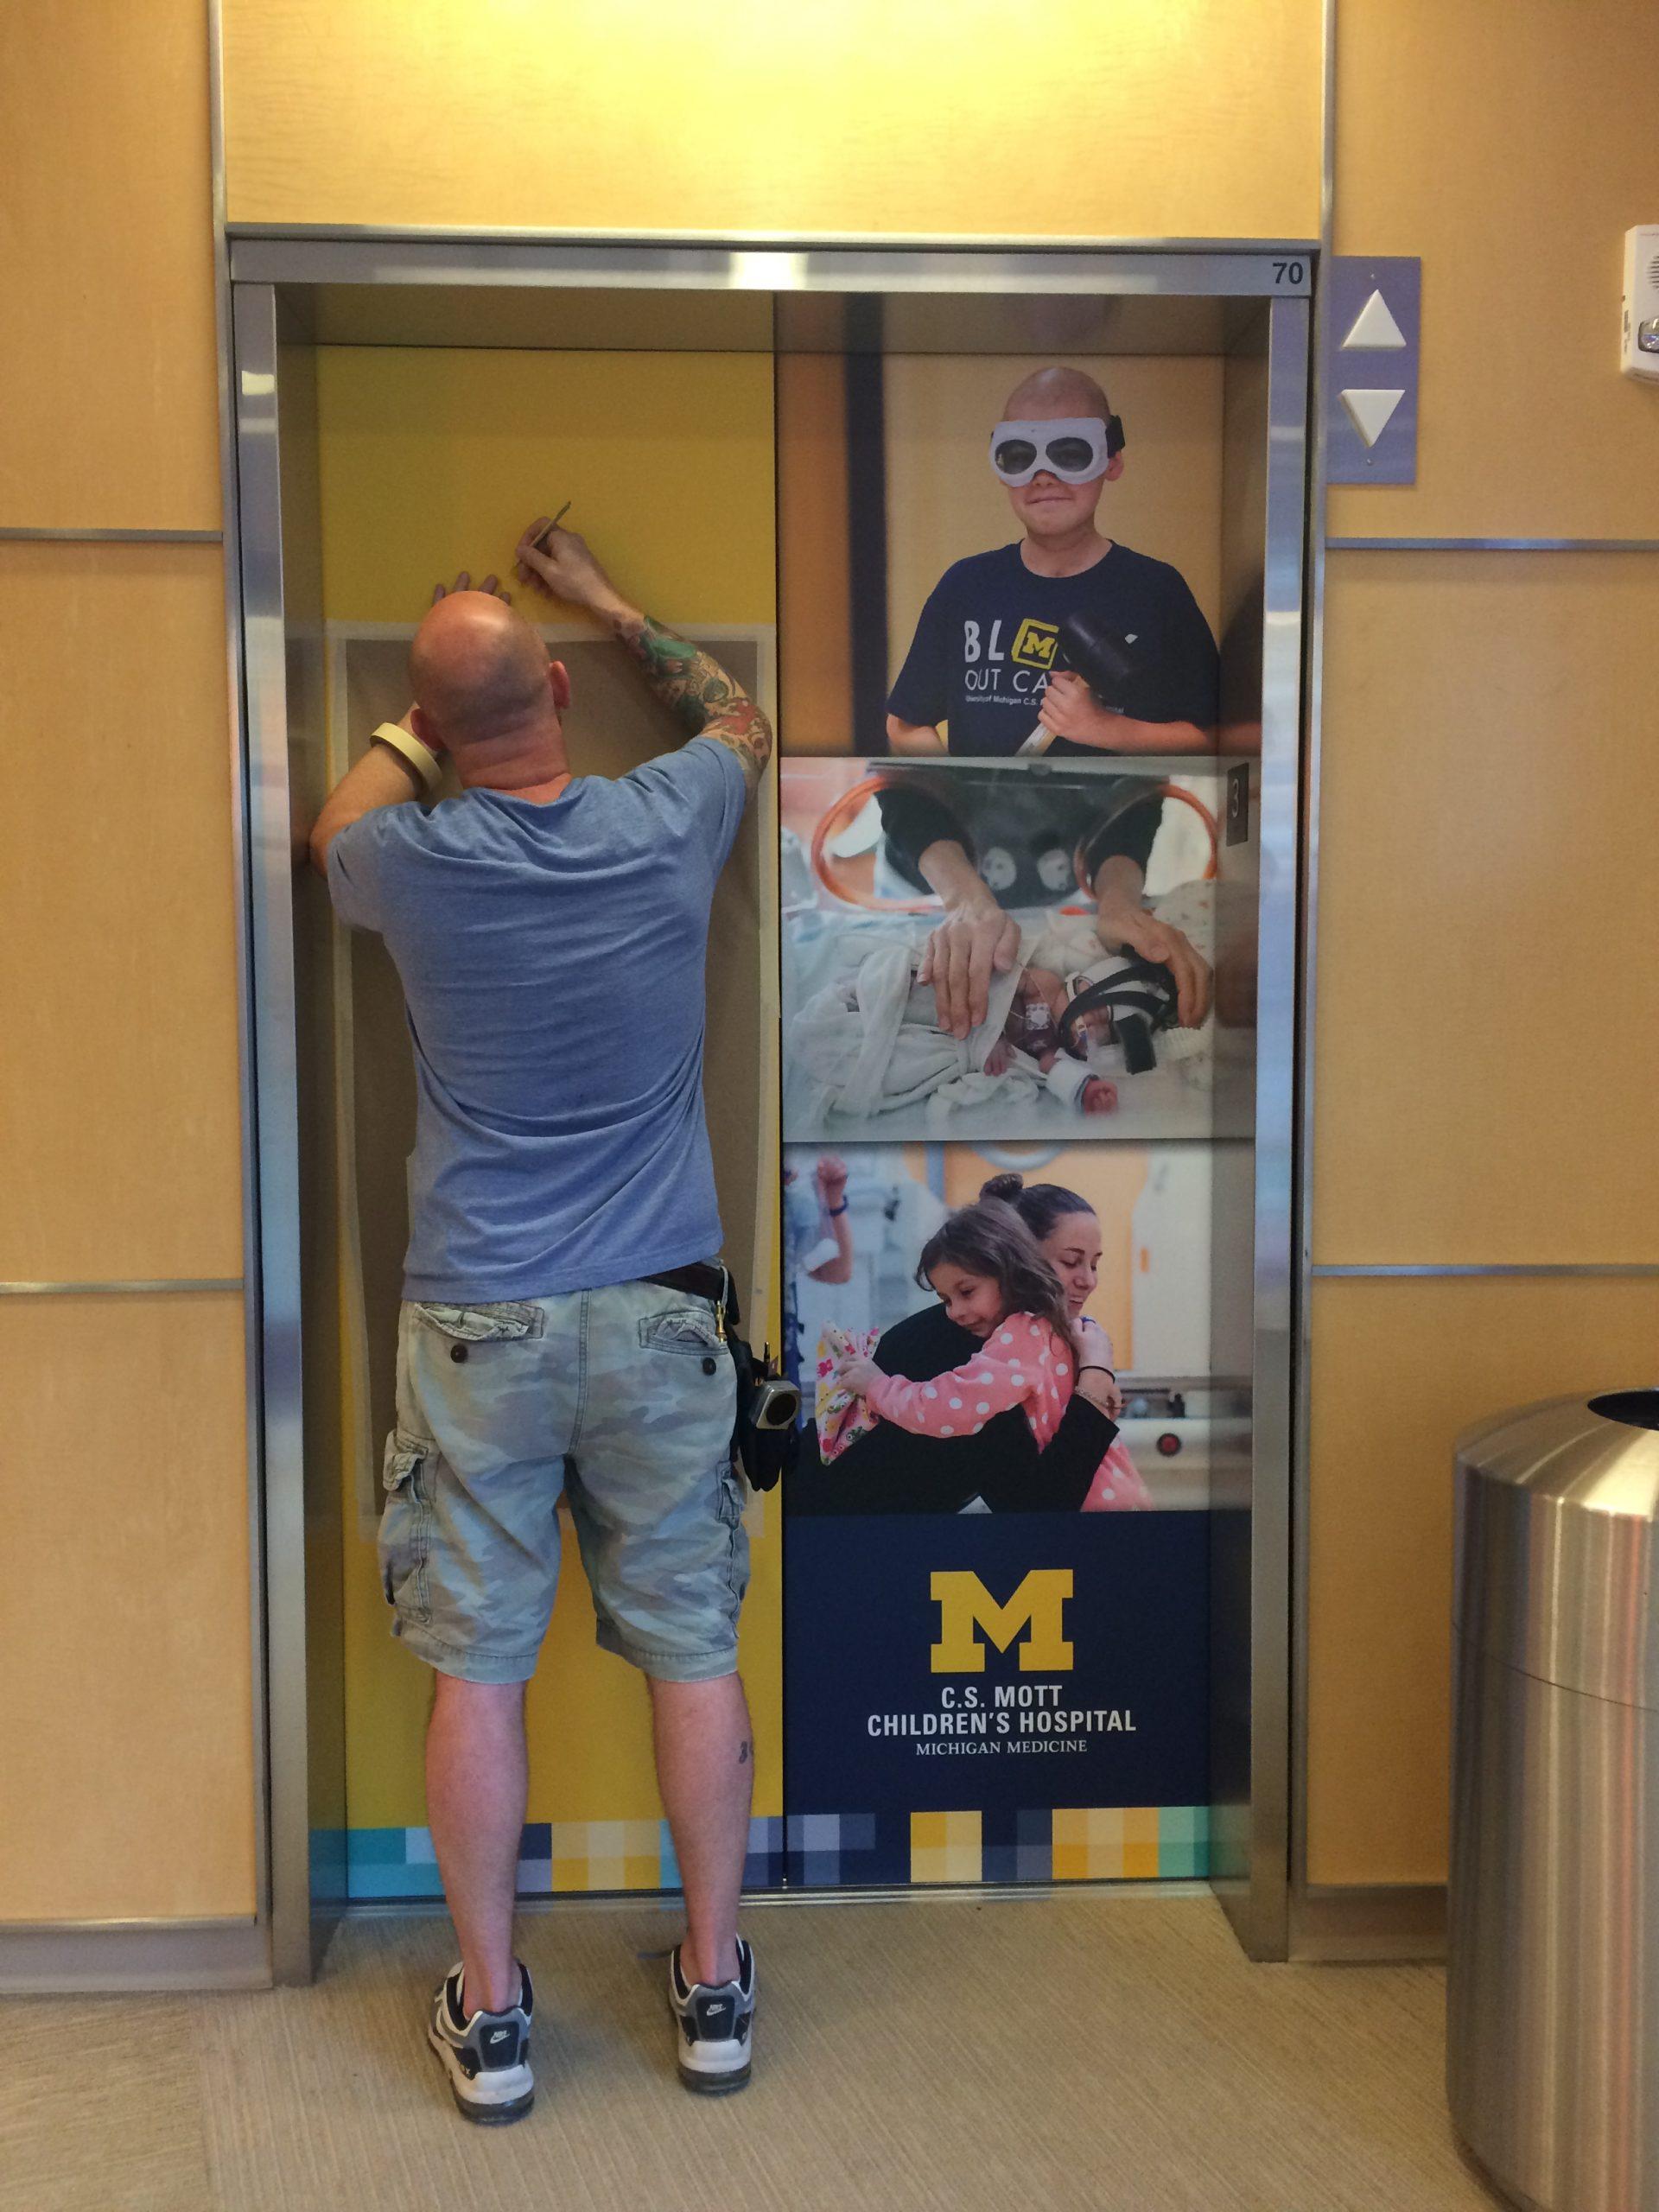 CS Mott Childrens Hospital Elevators - 02